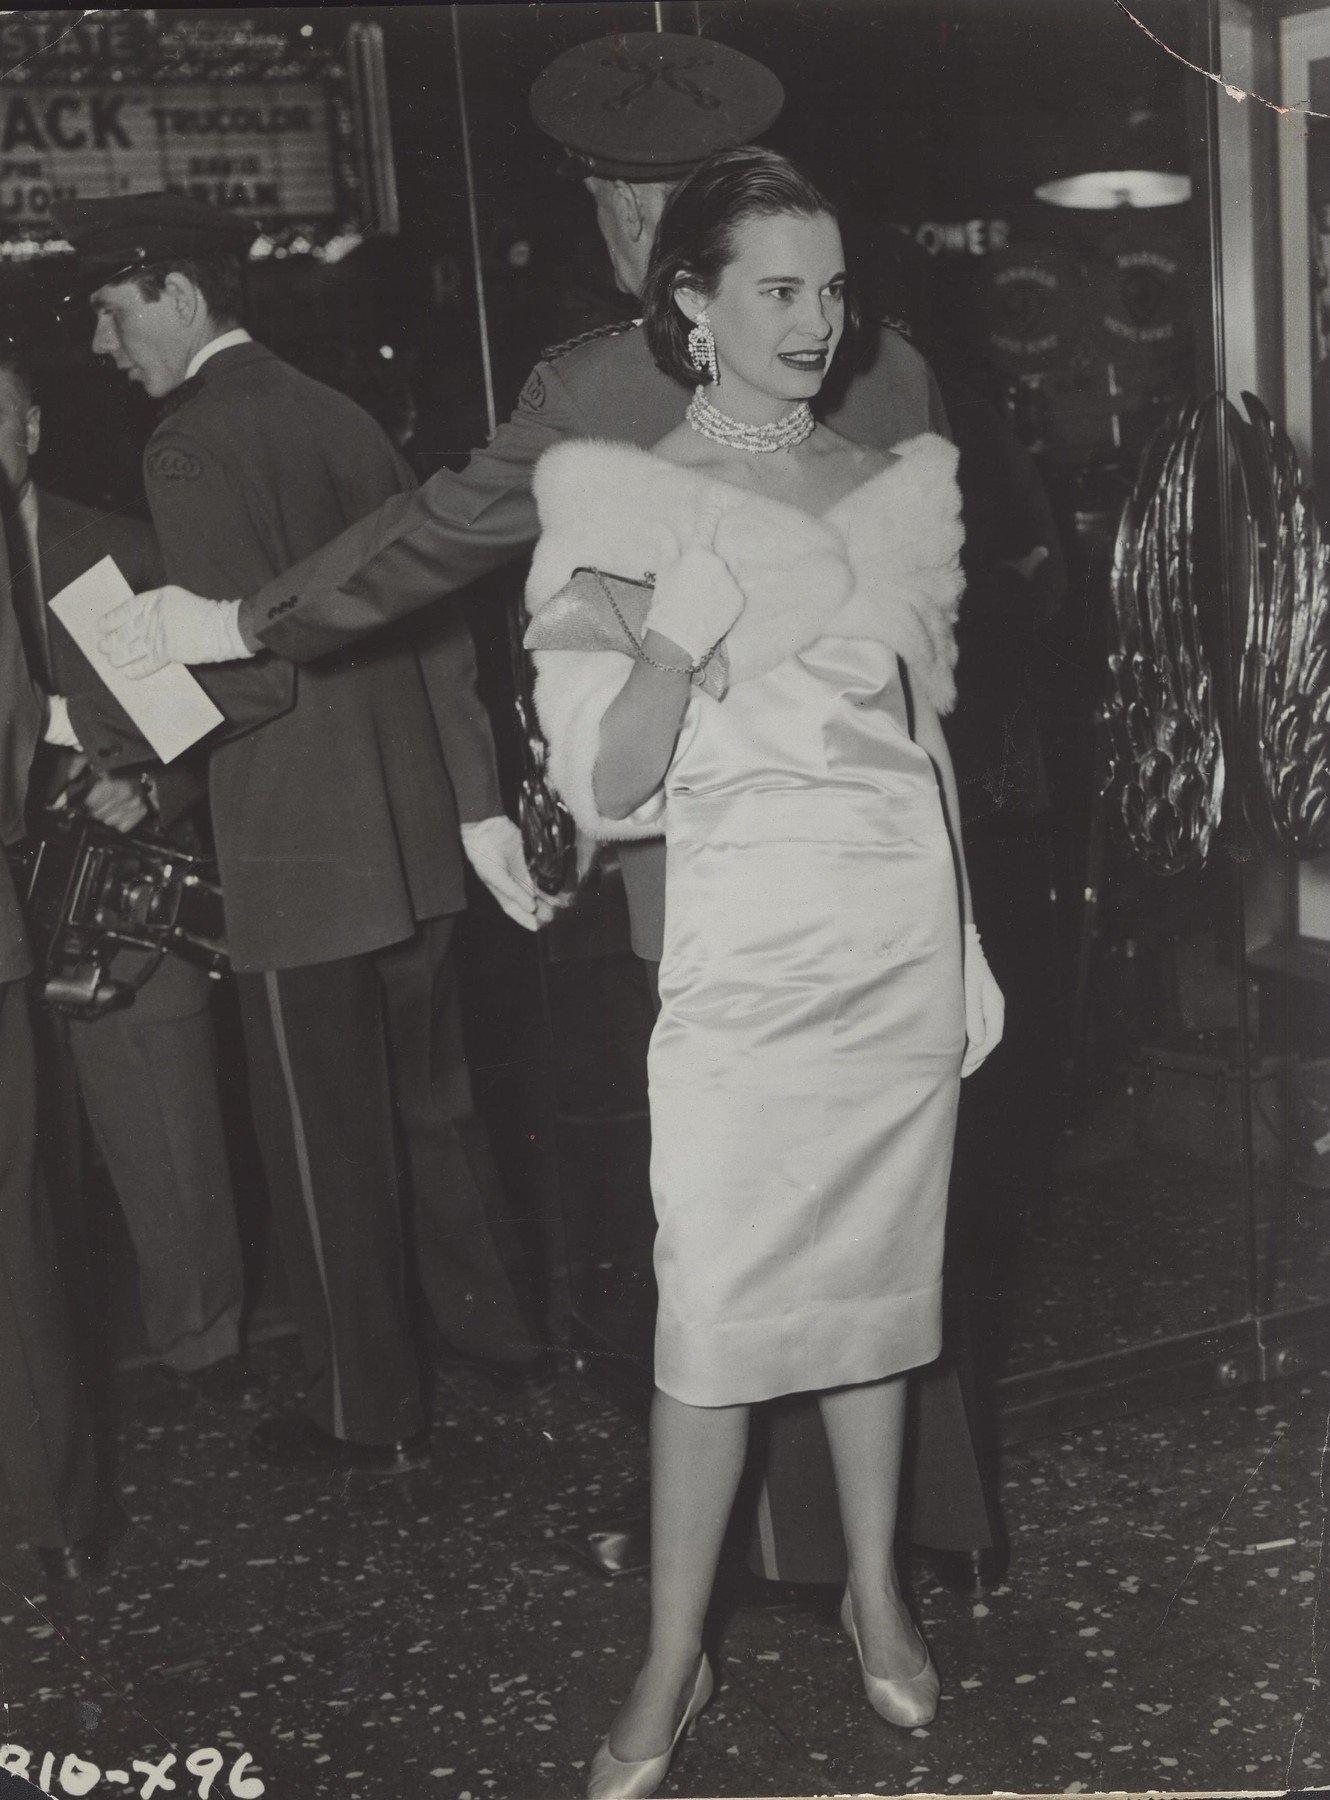 Los Angeles, CA  - Gloria Vanderbilt Has Passed Away Aged 95. **FILE PHOTOS**  BACKGRID USA 17 JUNE 2019, Image: 448668171, License: Rights-managed, Restrictions: , Model Release: no, Credit line: Profimedia, Backgrid USA